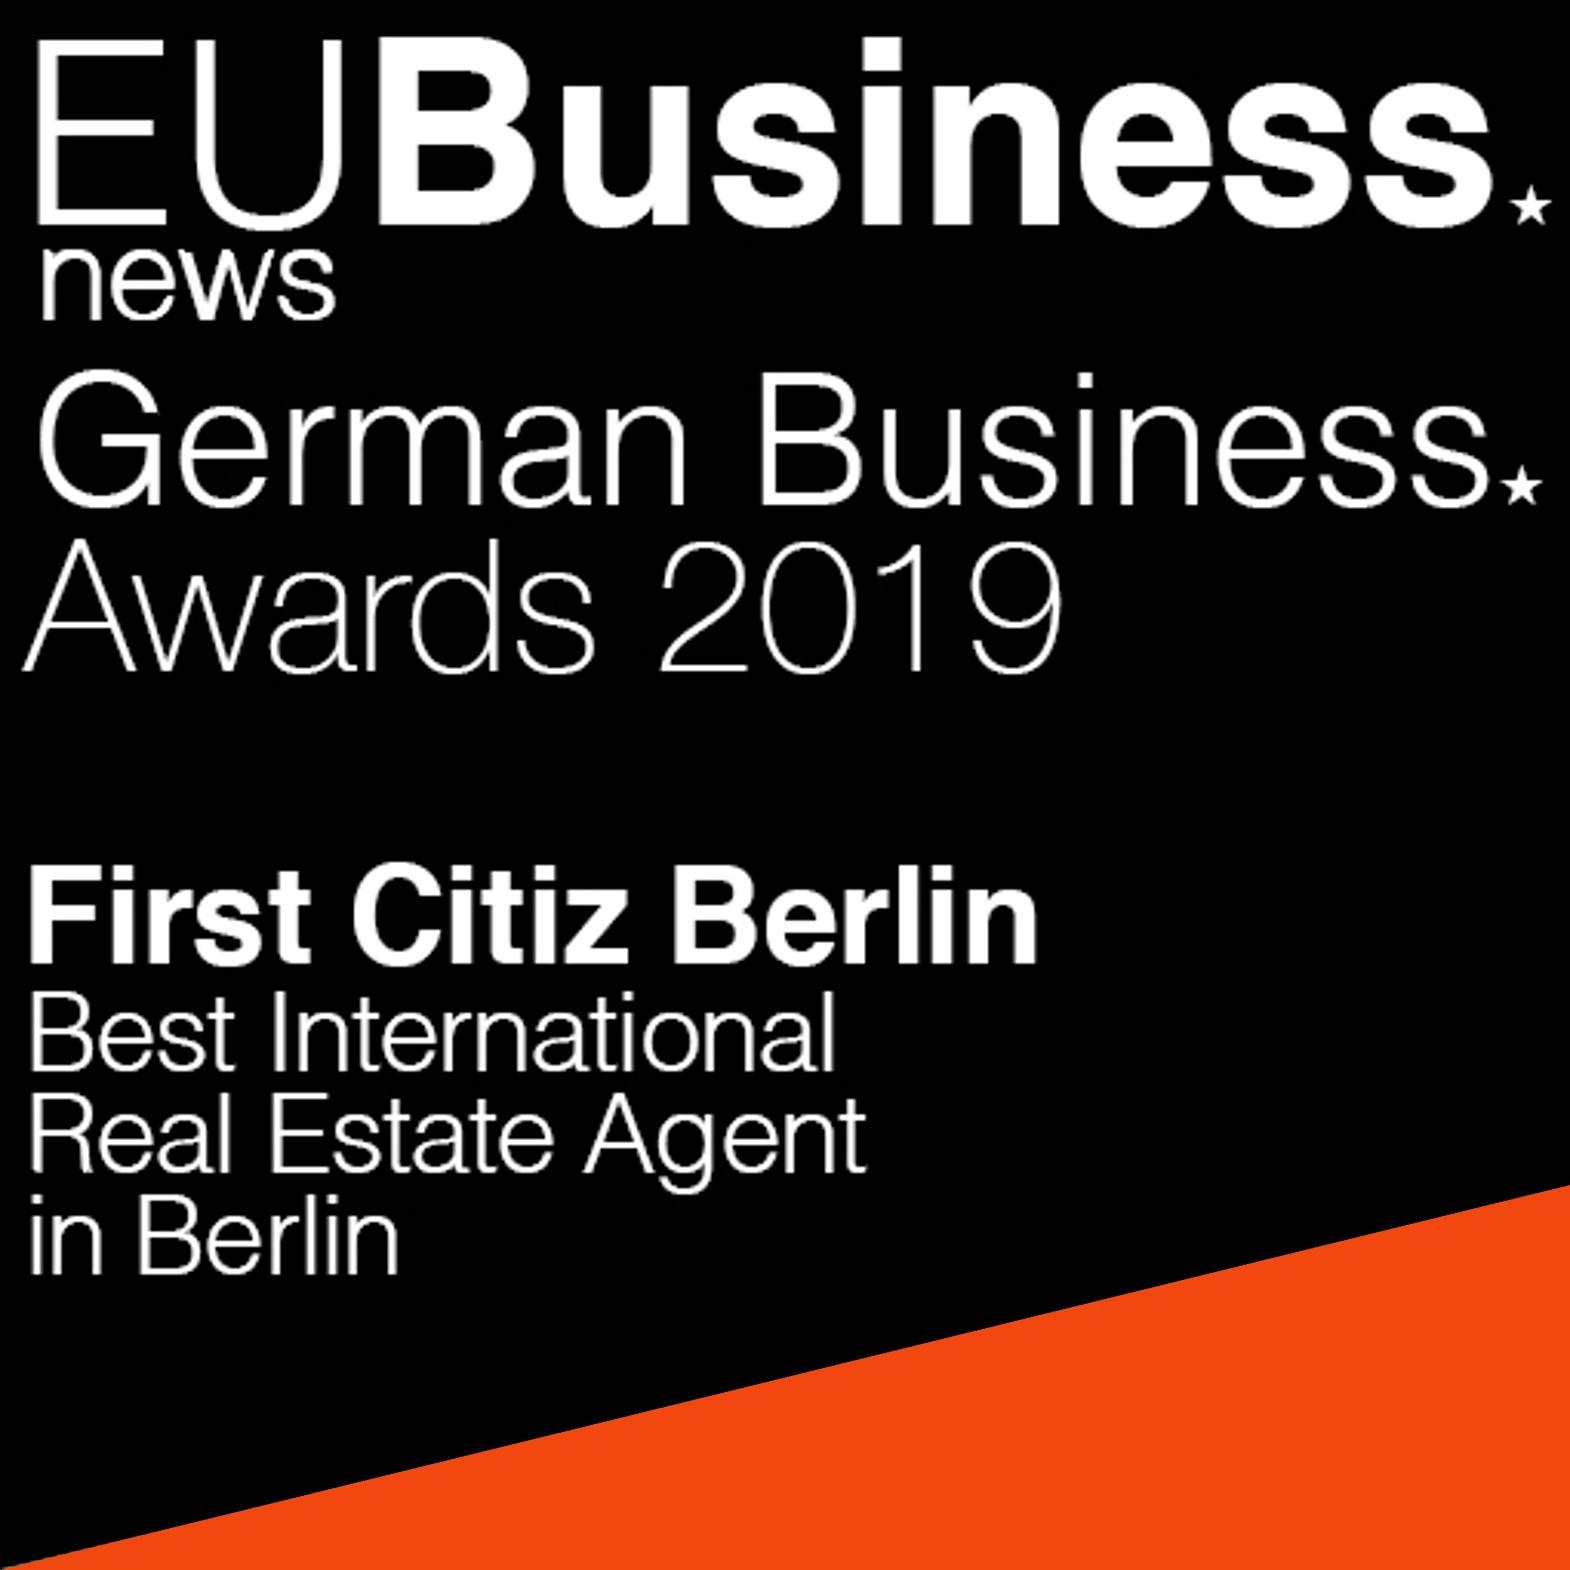 Best International Real Estate Agent in Berlin